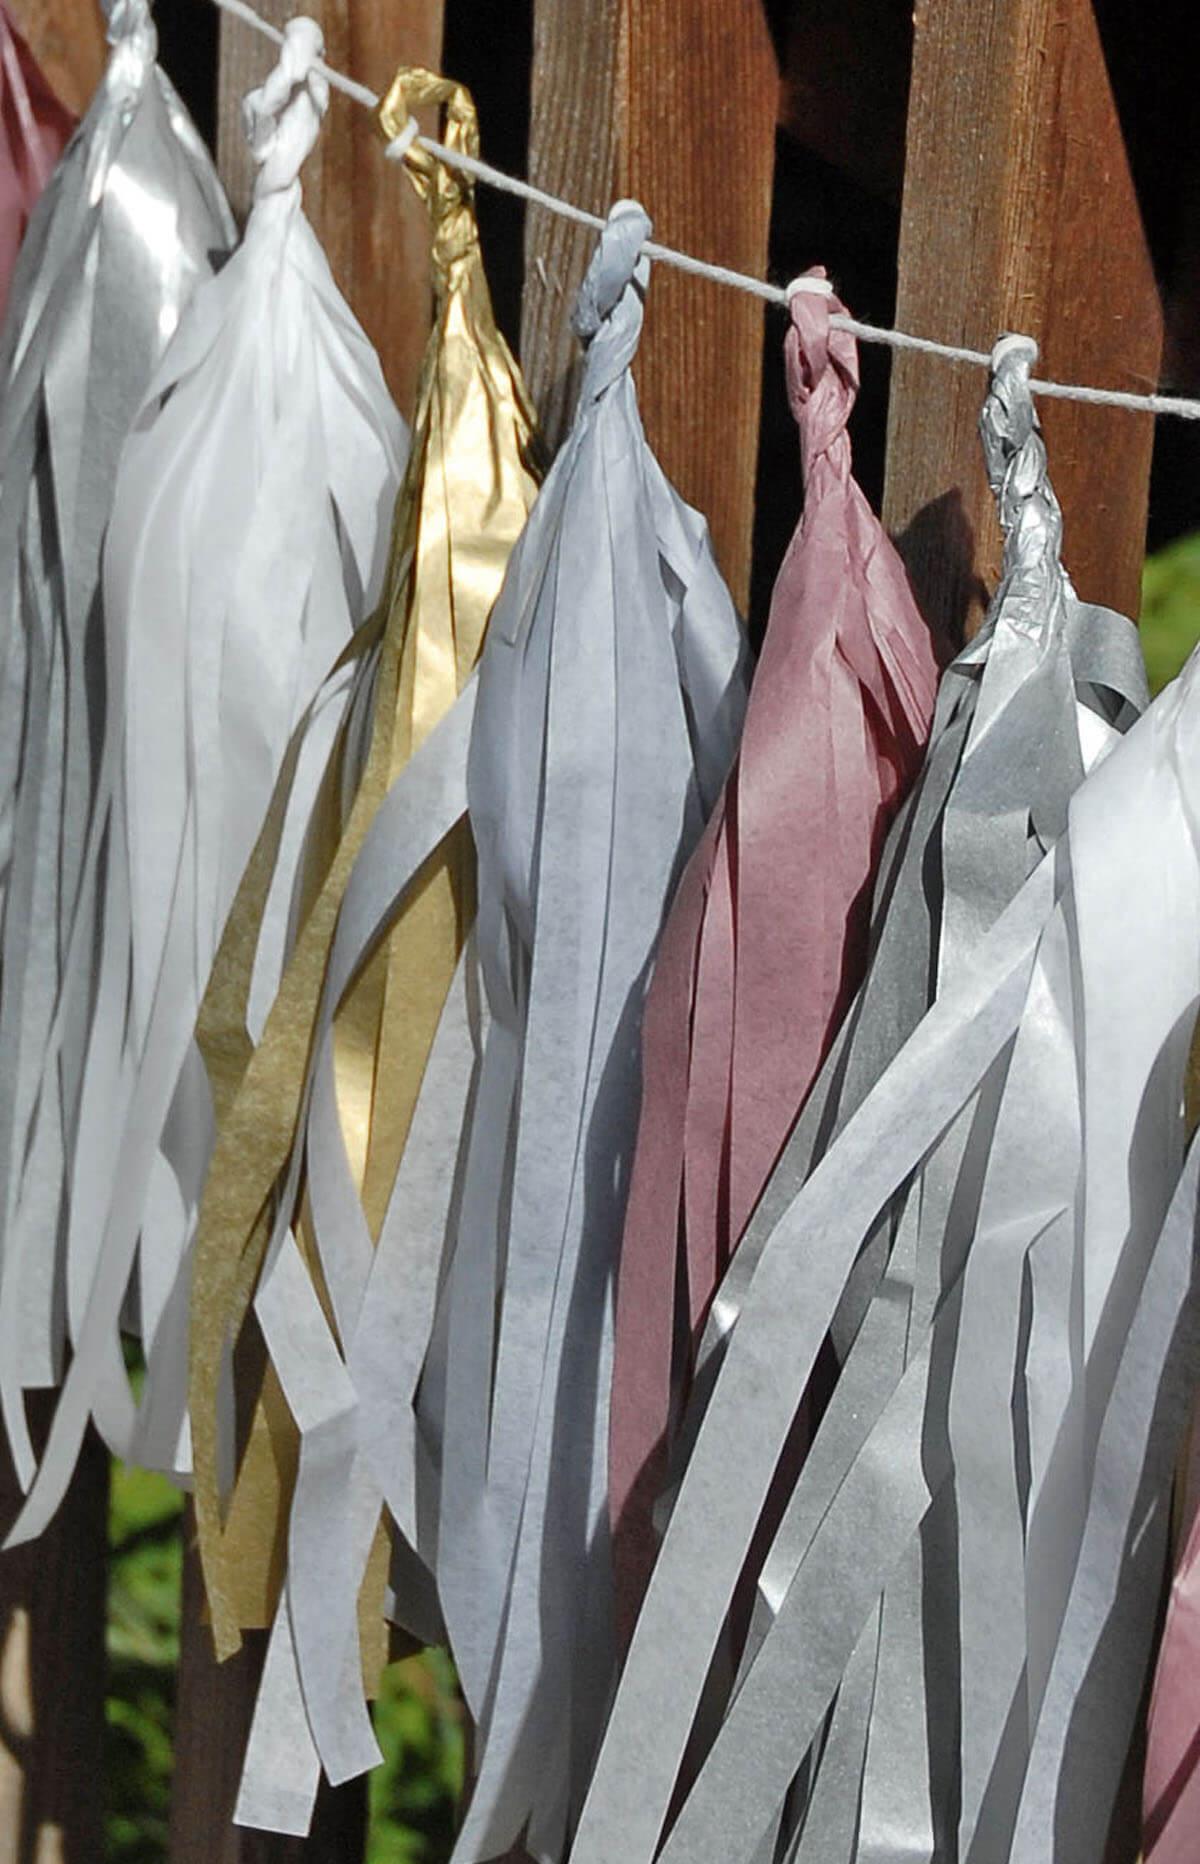 Tissue Paper Tassel Garland Kit Elegant Party Silver